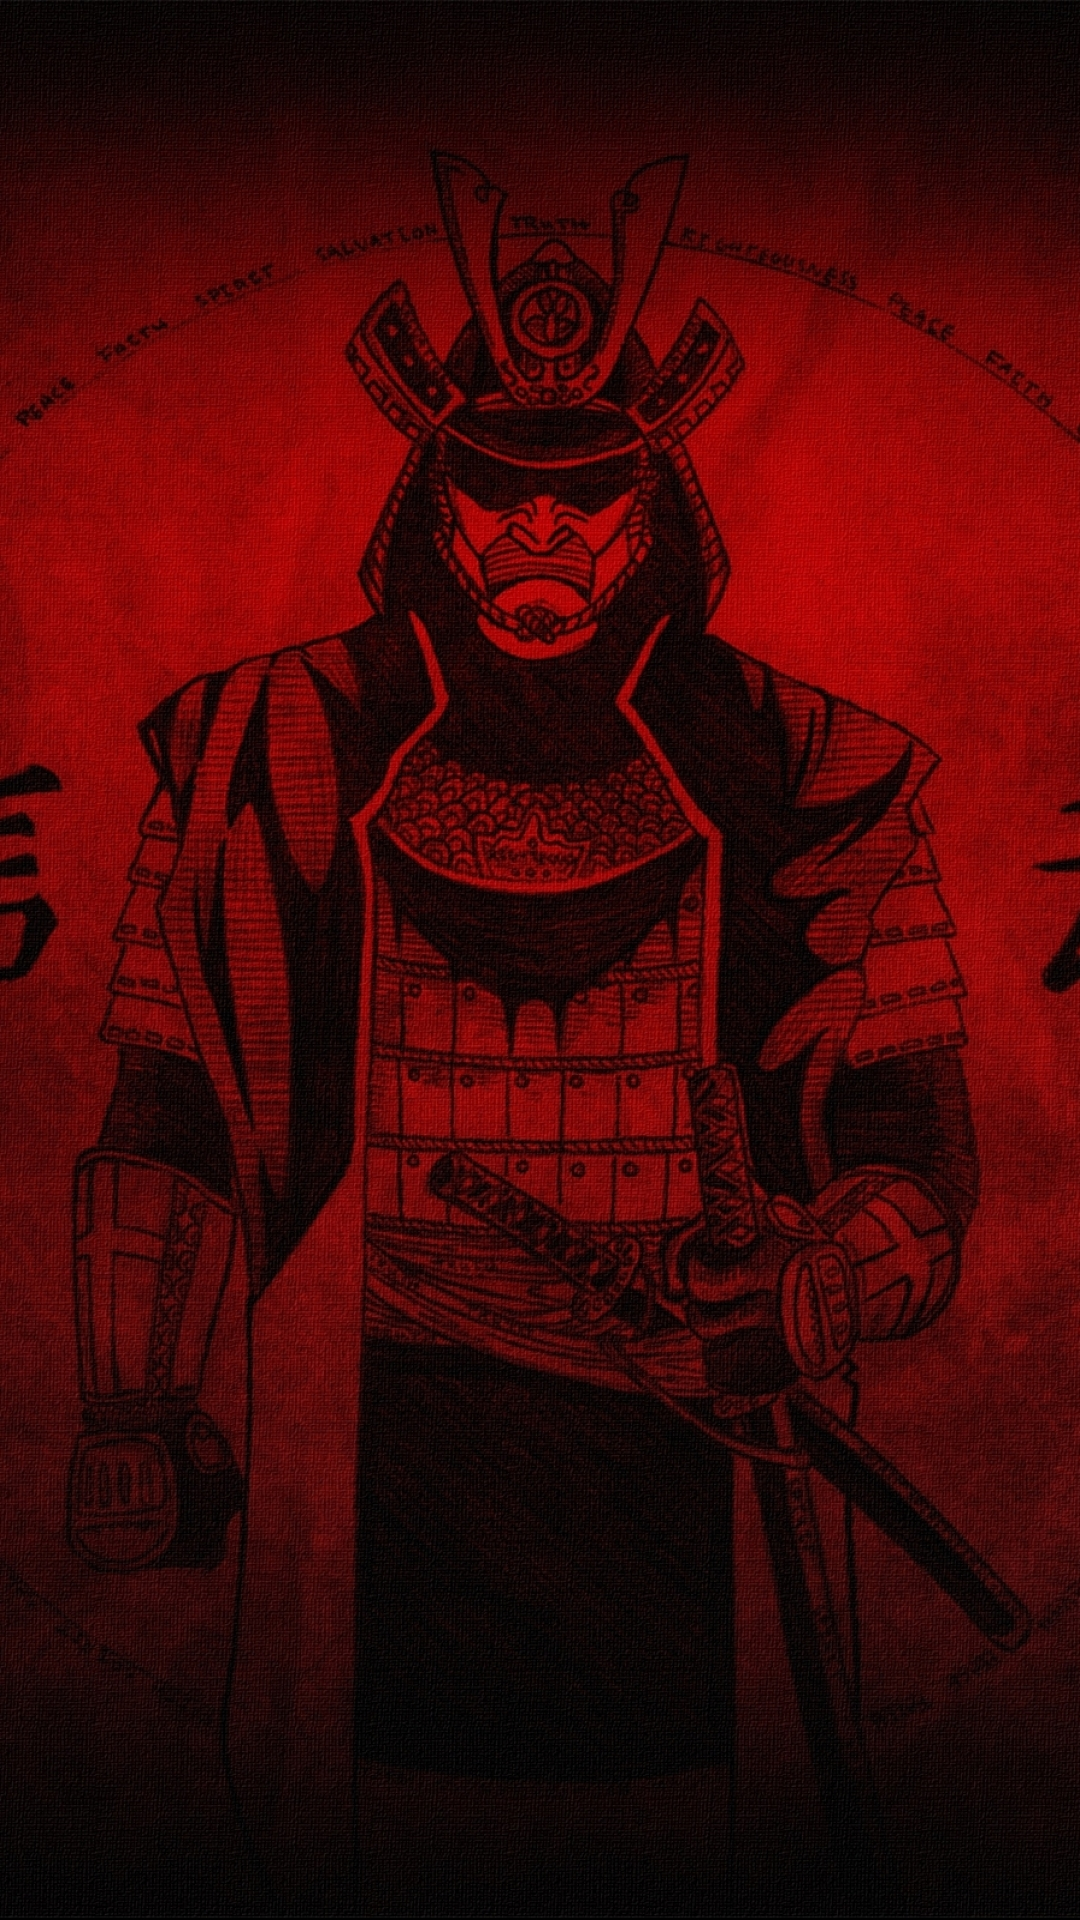 Drawn samurai iphone 6 wallpaper Check Wallpaper 6 Plus 292187